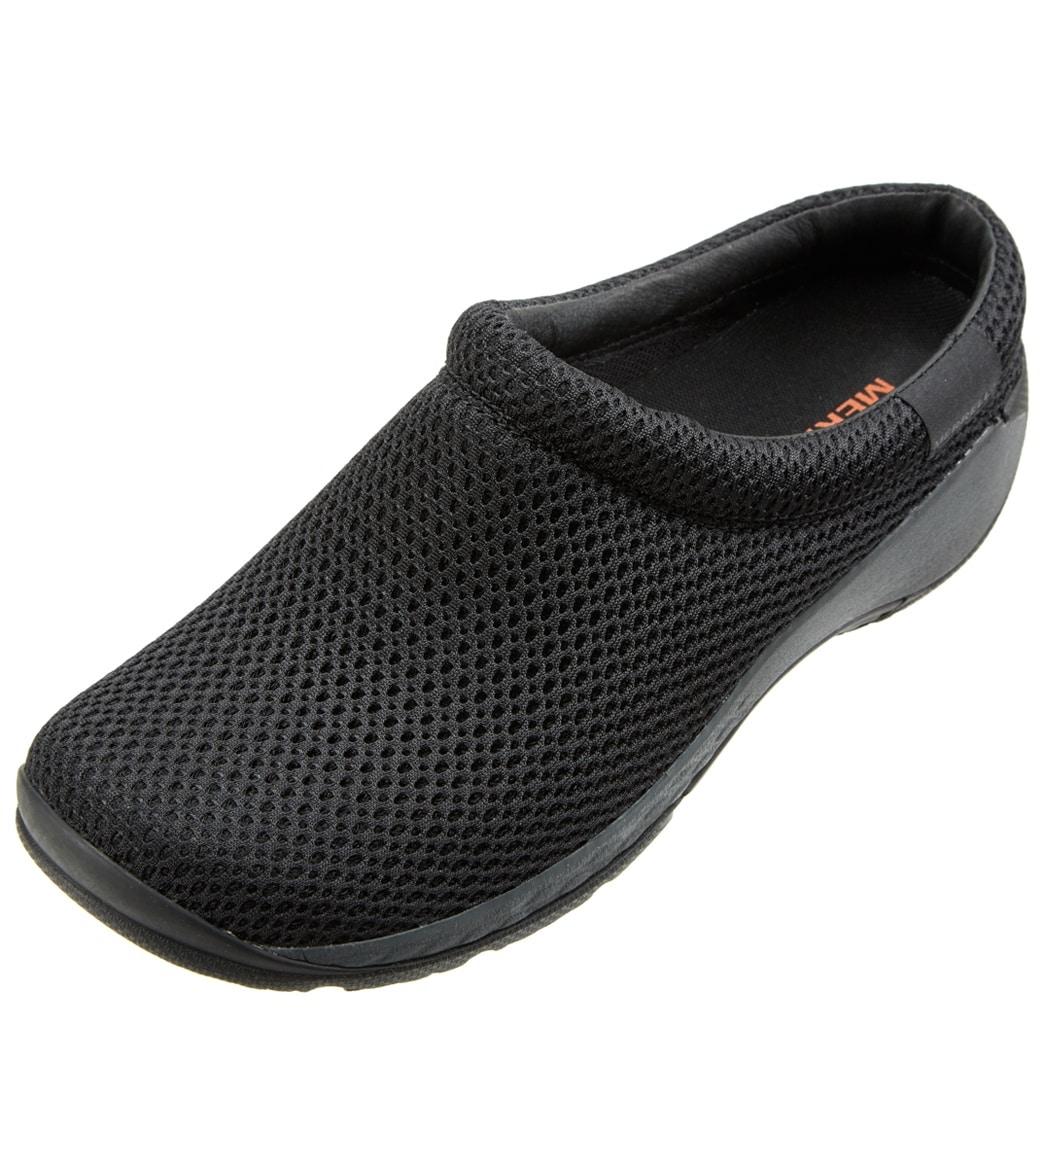 71025cc2 Merrell Women's Encore Q2 Breeze Slip On Shoe